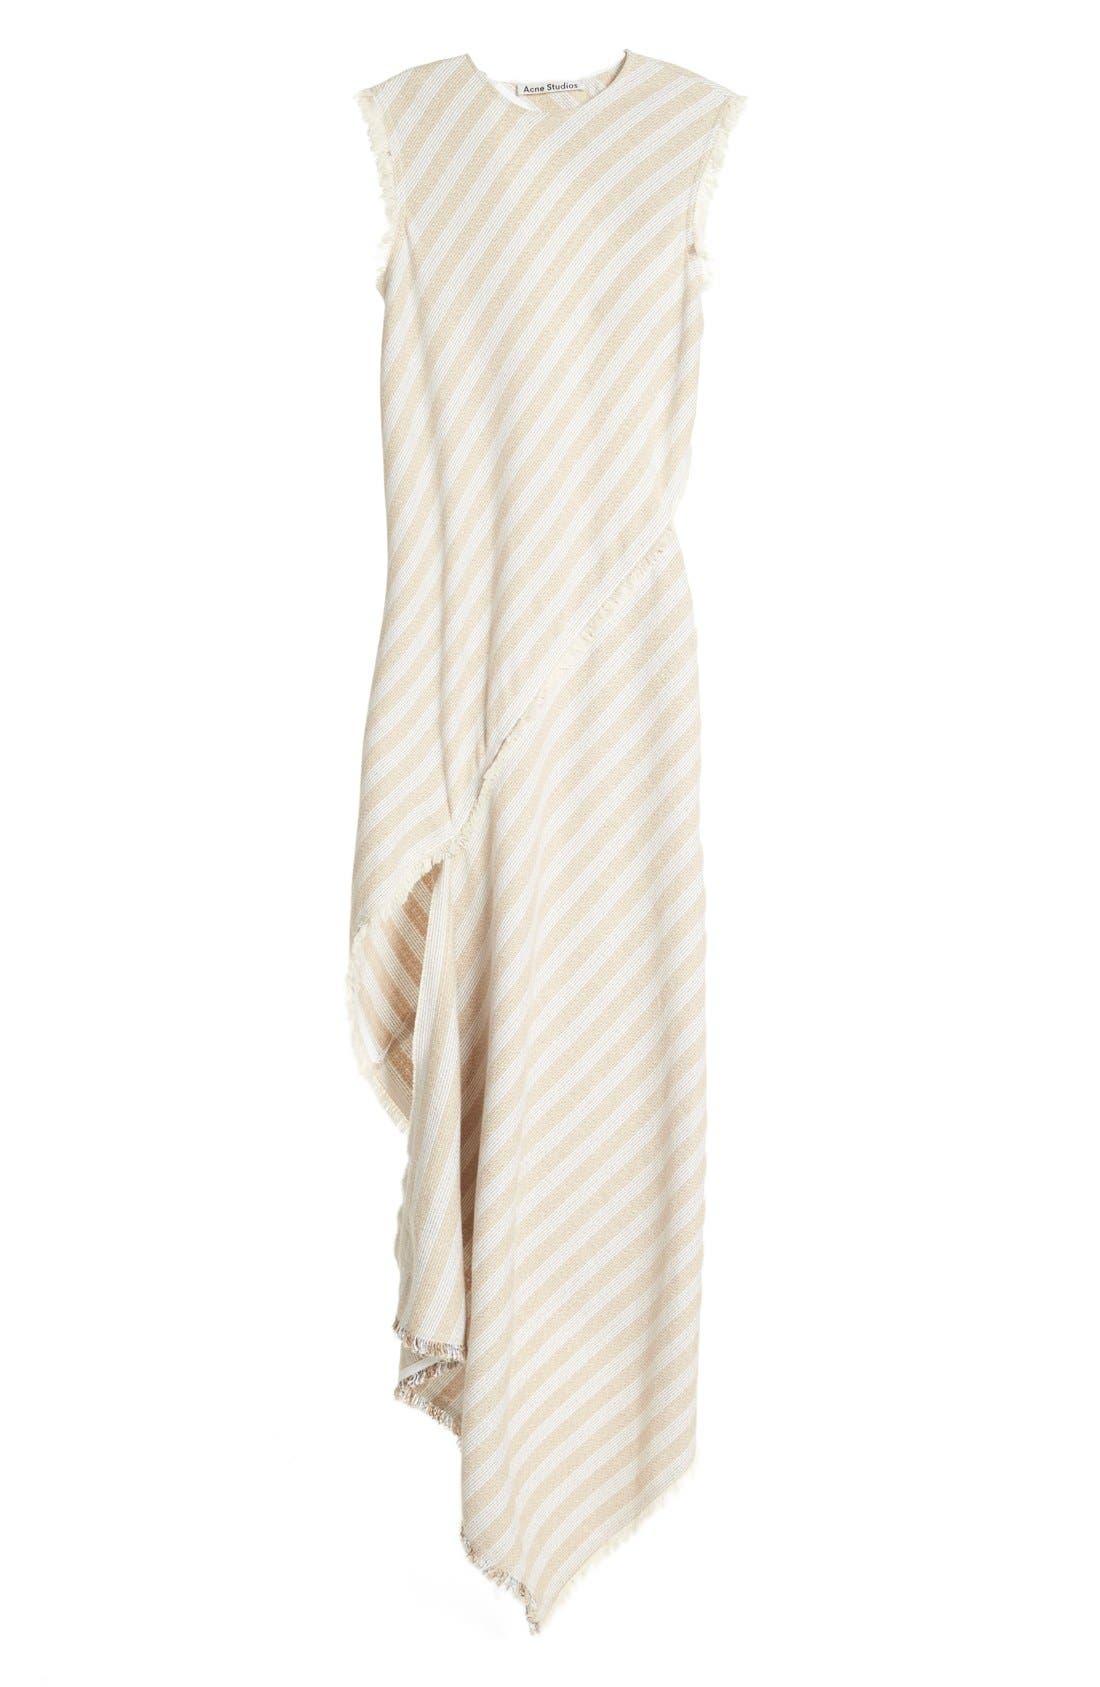 'Cosby' Stripe Sleeveless Dress,                             Alternate thumbnail 4, color,                             Natural Stripe